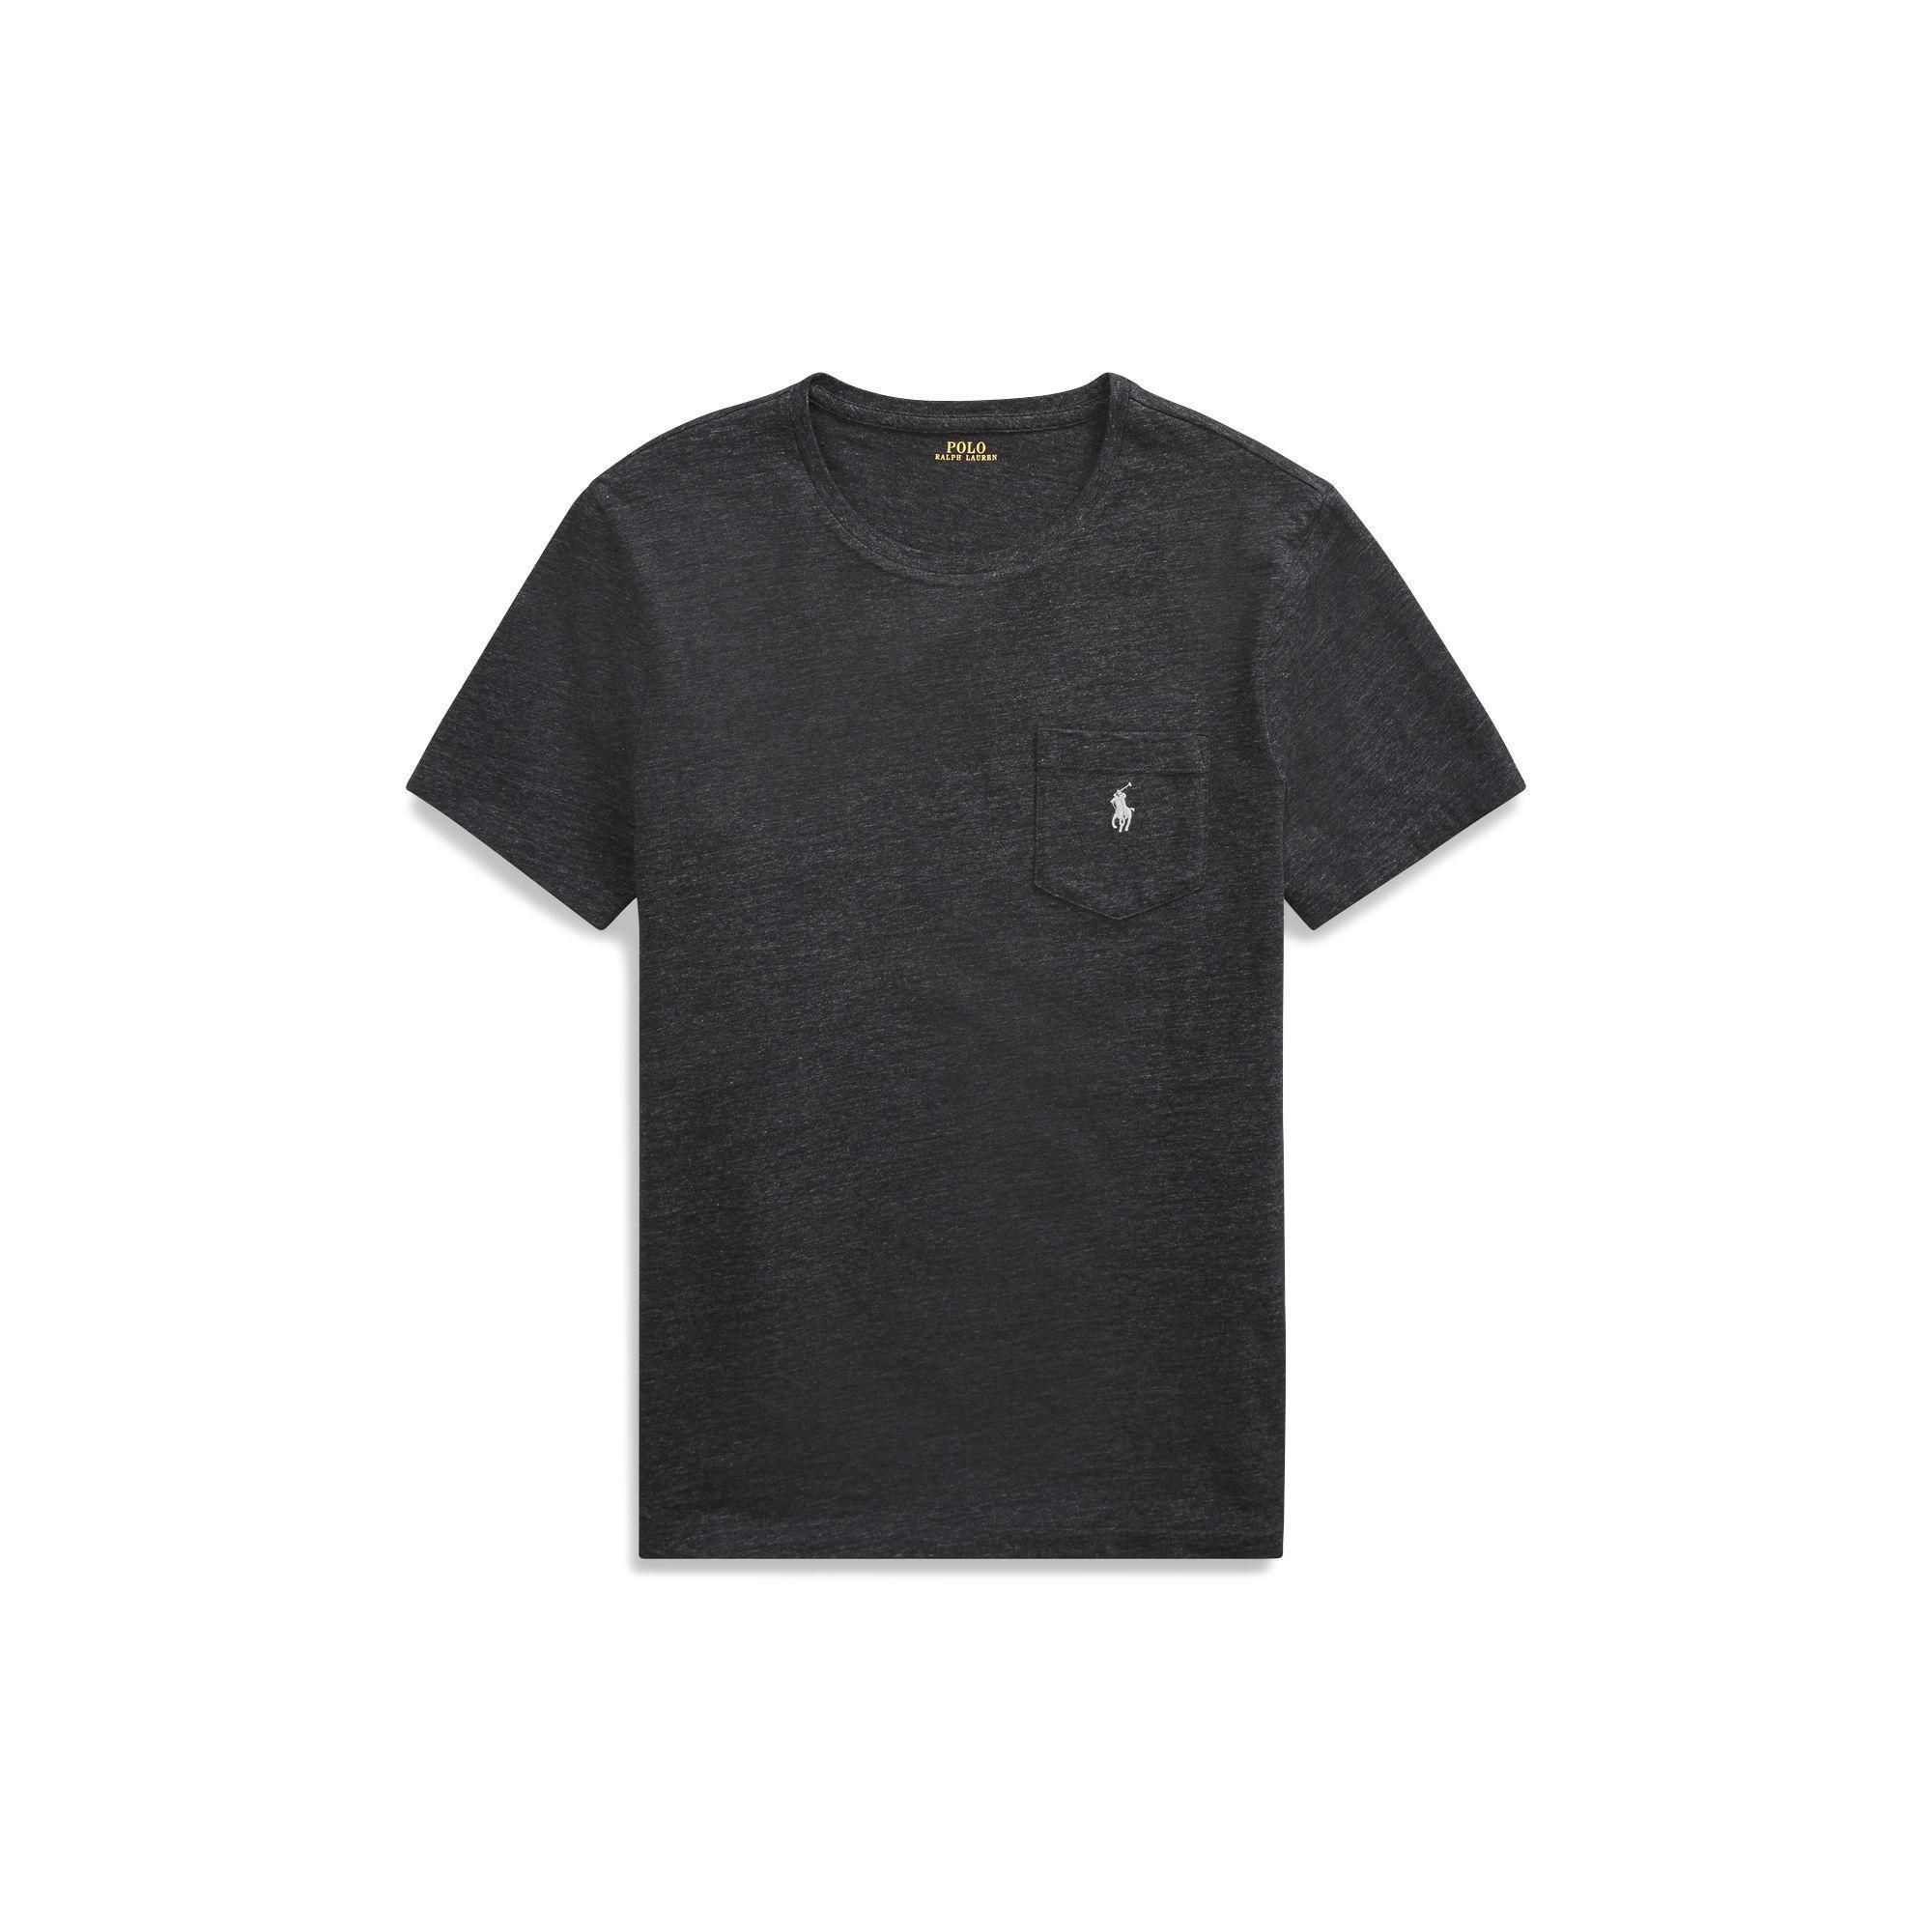 69fccb2b46f1a8 Polo Ralph Lauren Custom Slim Fit Pocket T-shirt in Black for Men - Lyst